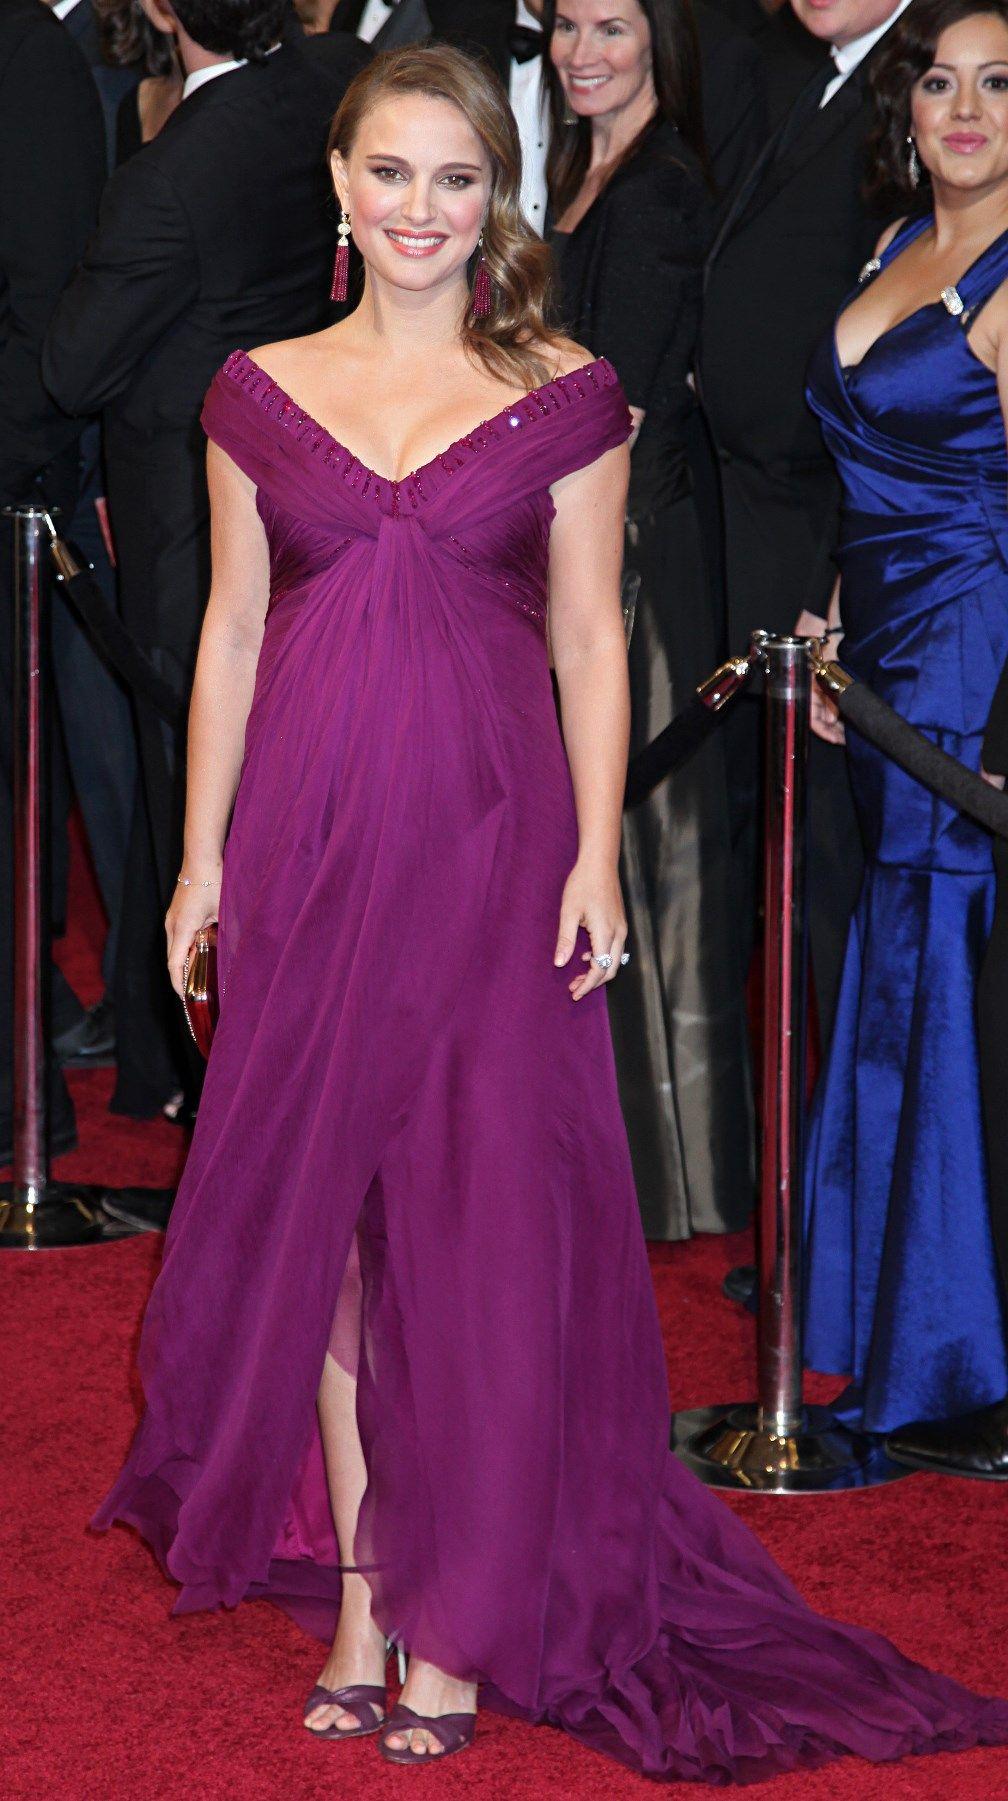 Pin de Fashion Dolling en Natalie Portman | Pinterest